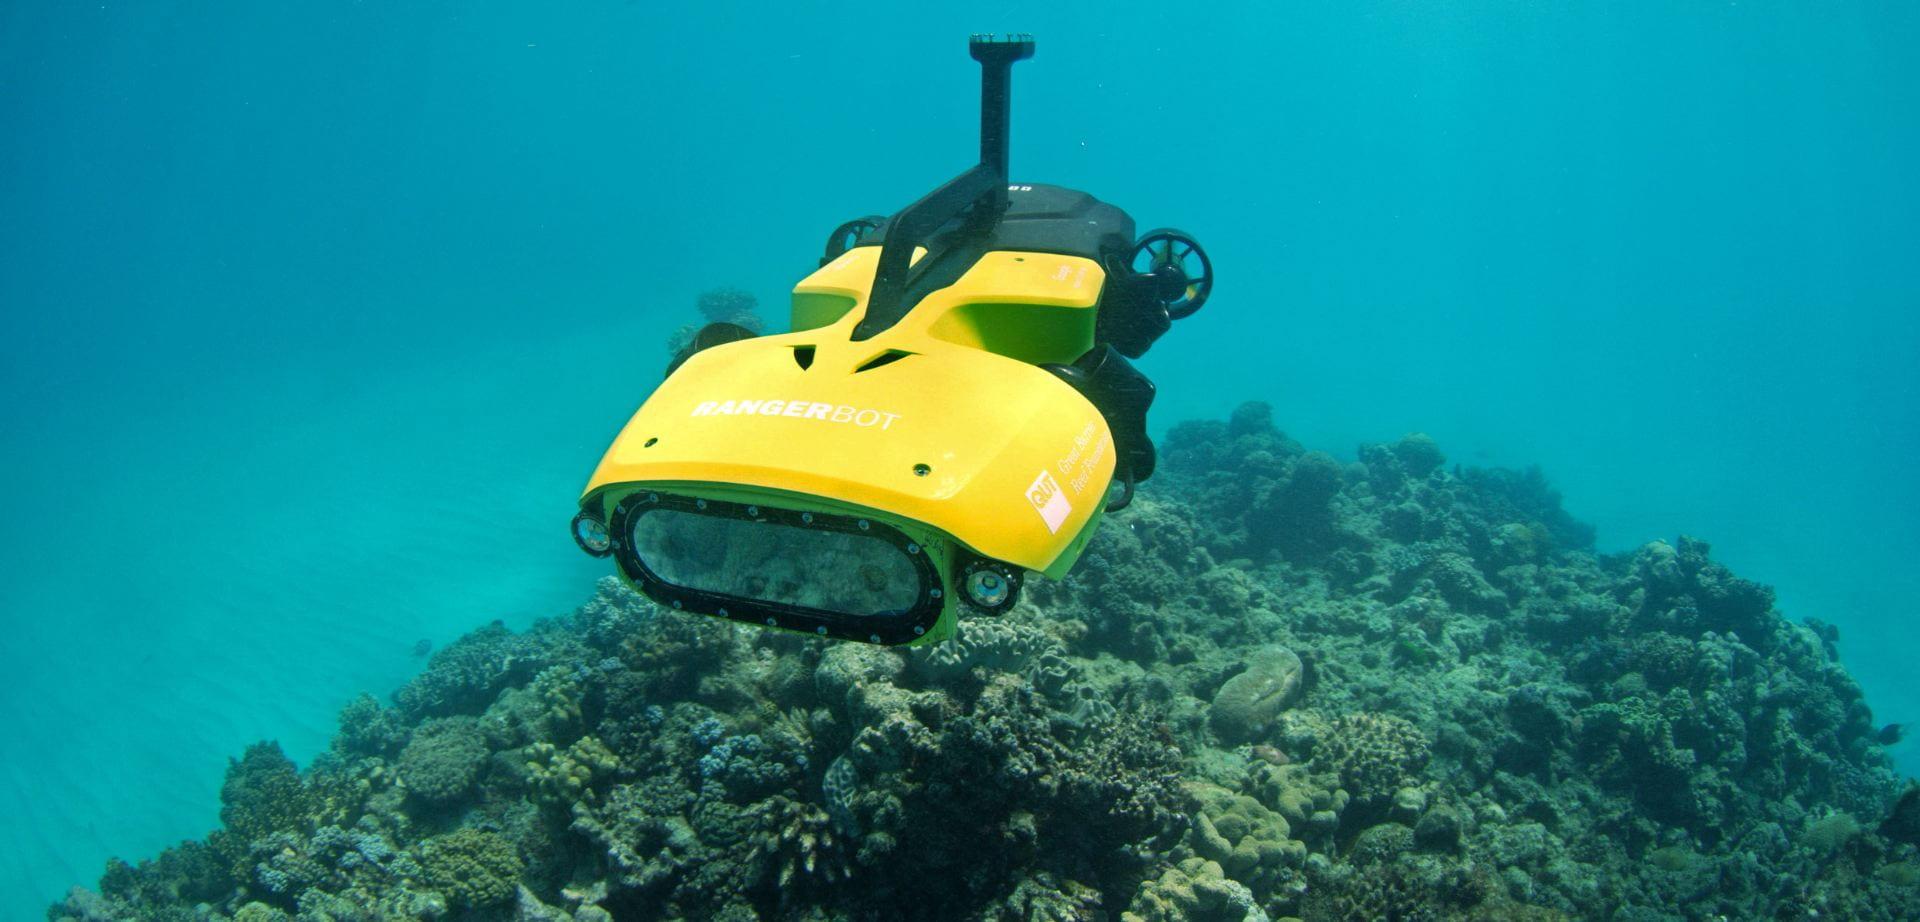 A yellow submersible autonomous vehicle navigates above a coral reef.